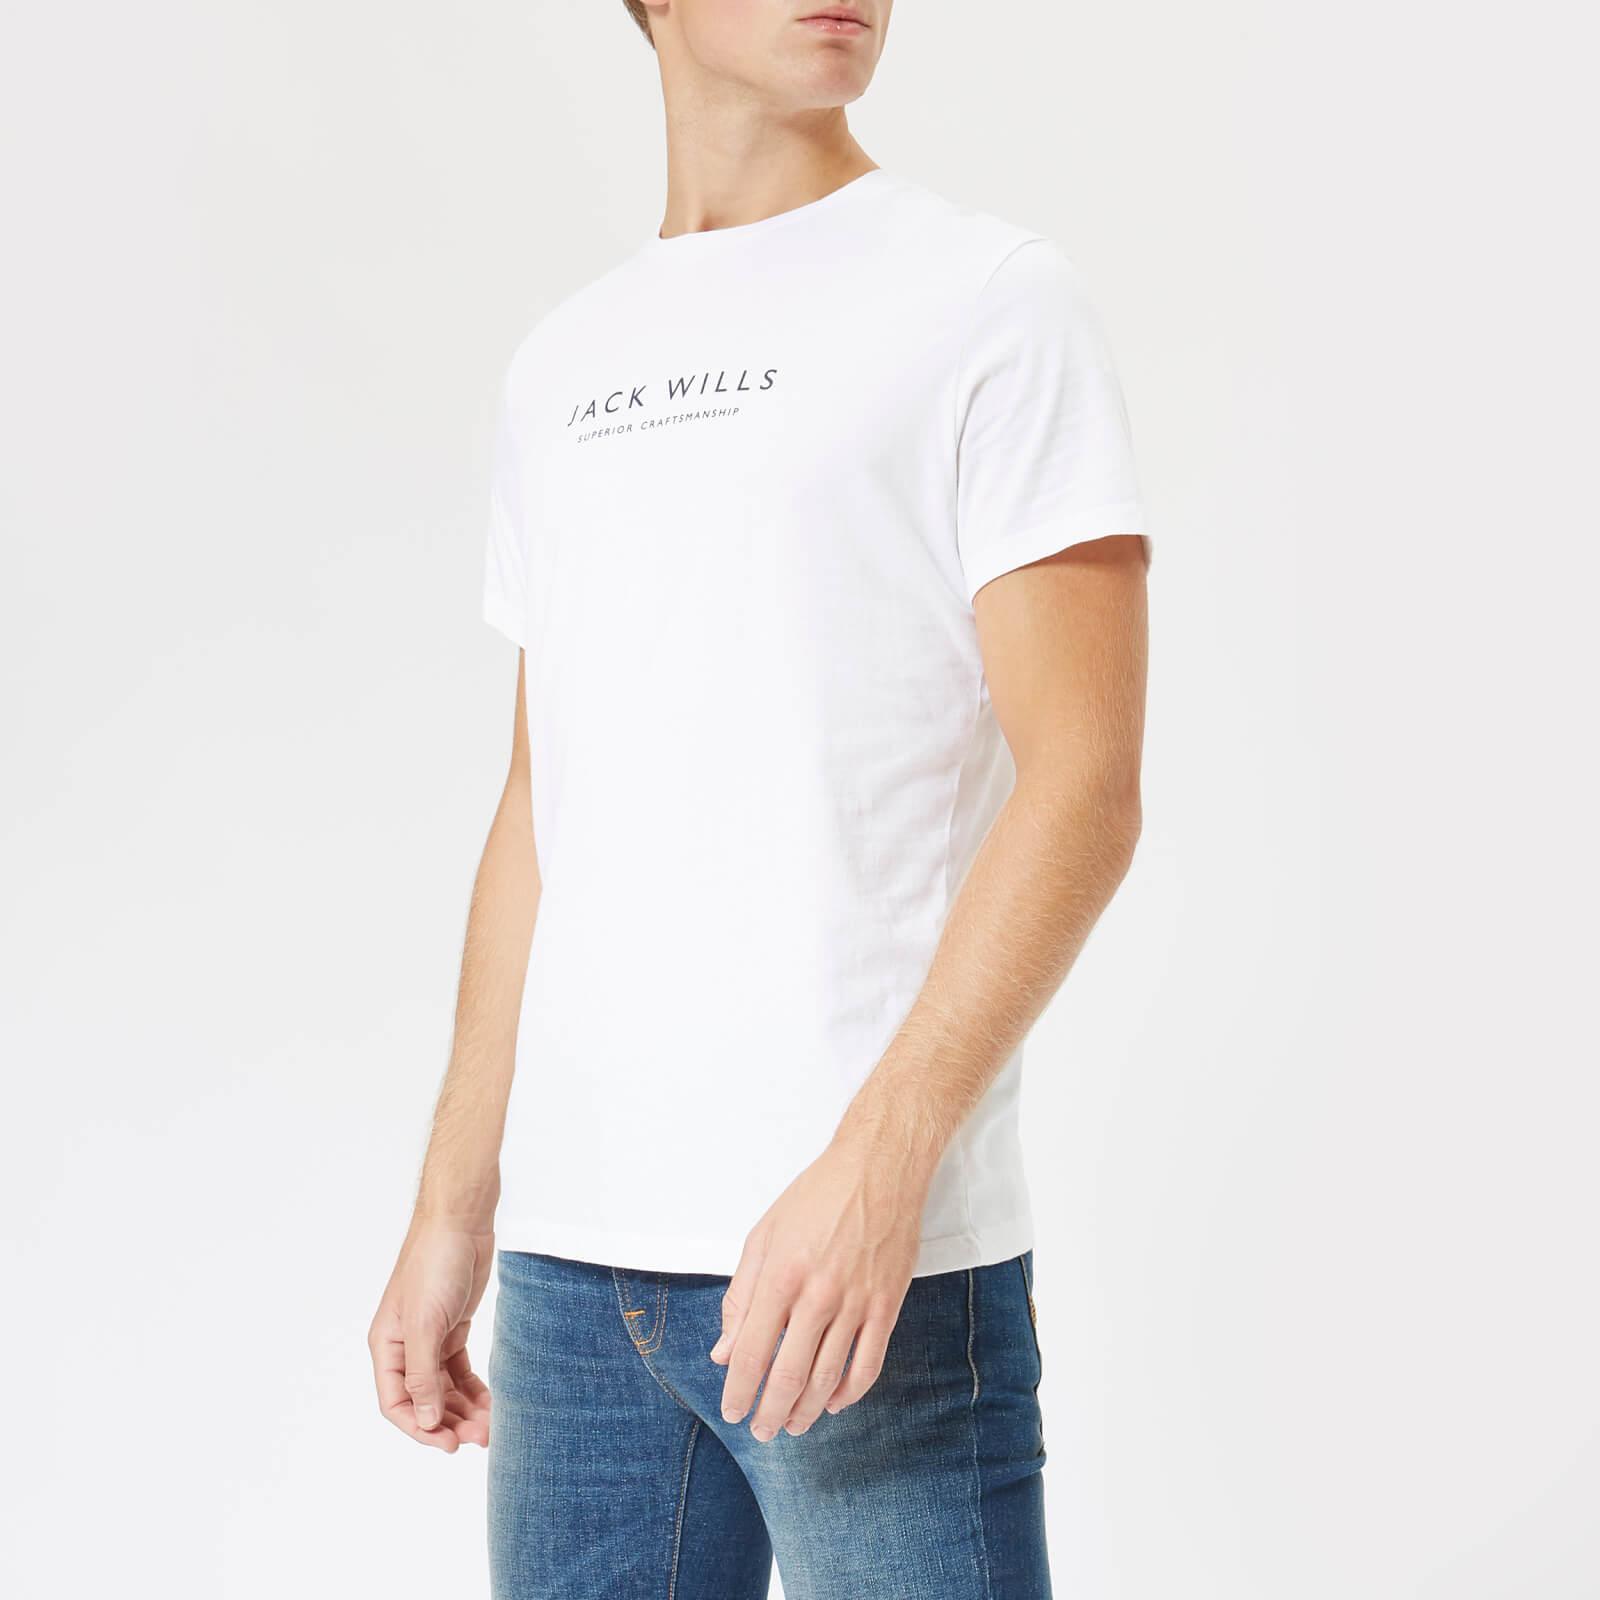 7e4421a142 Jack Wills Men's Graphic T-Shirt - White Clothing   TheHut.com